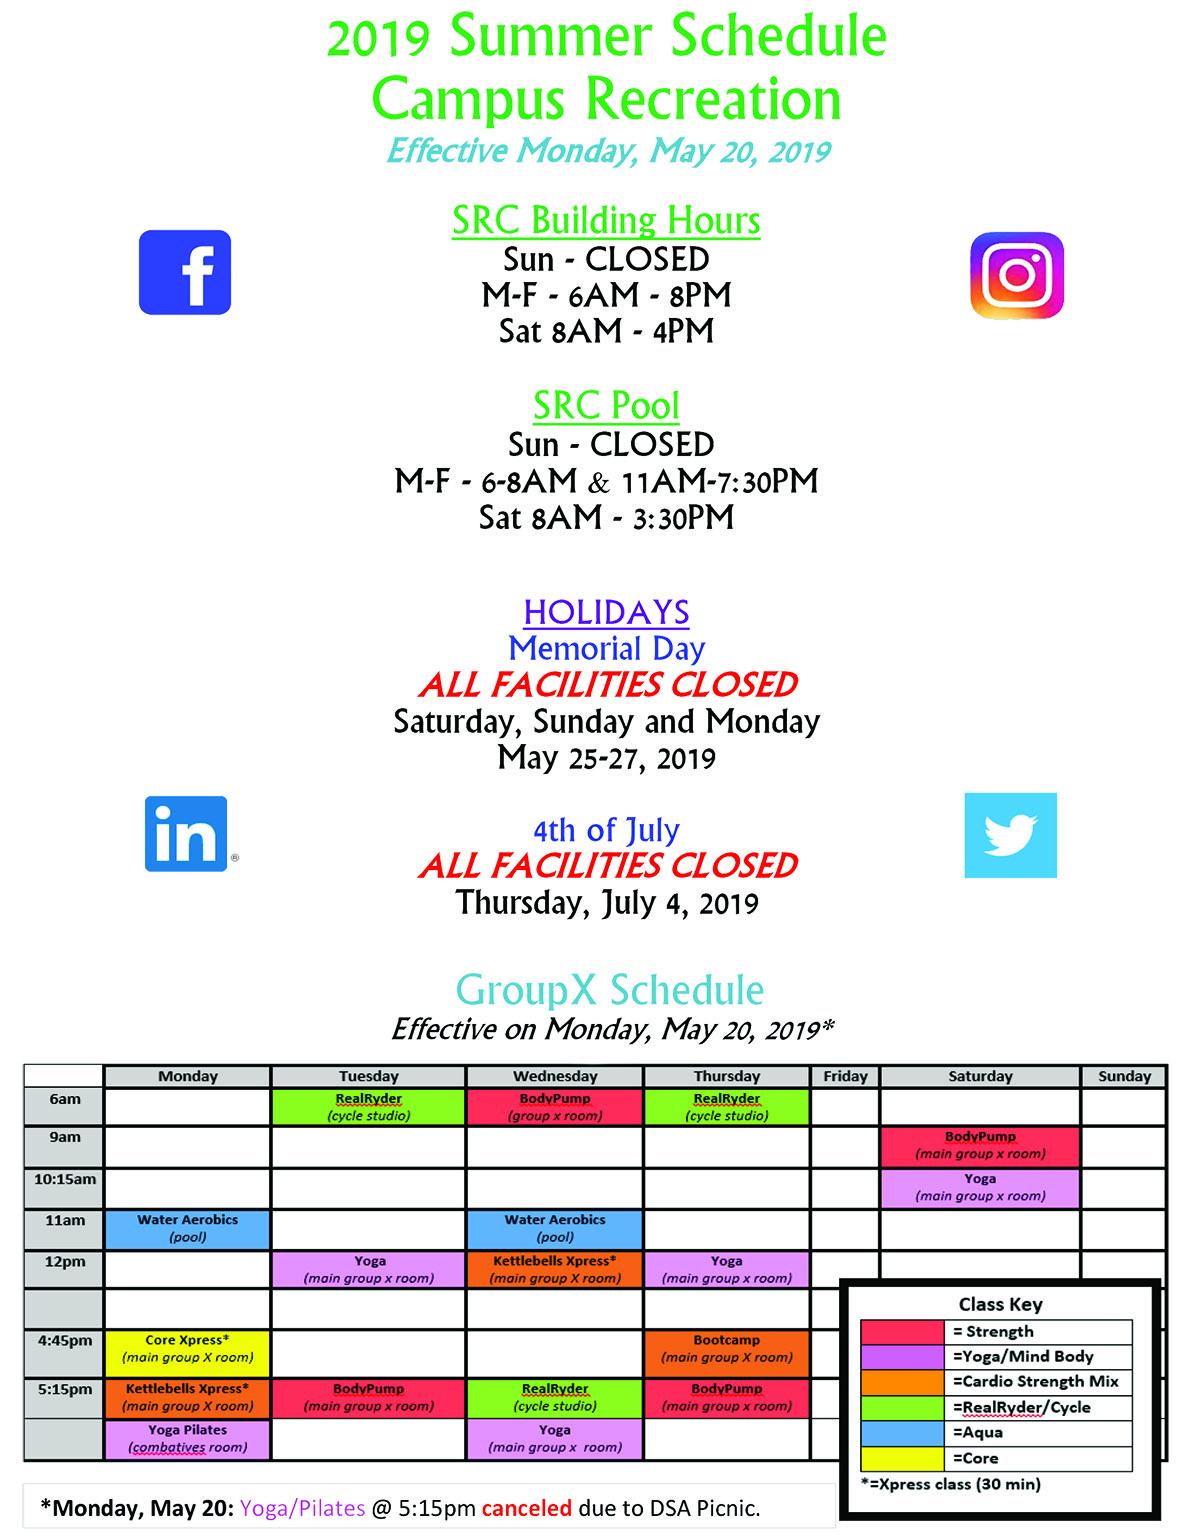 Campus Rec Summer 2019 Schedule